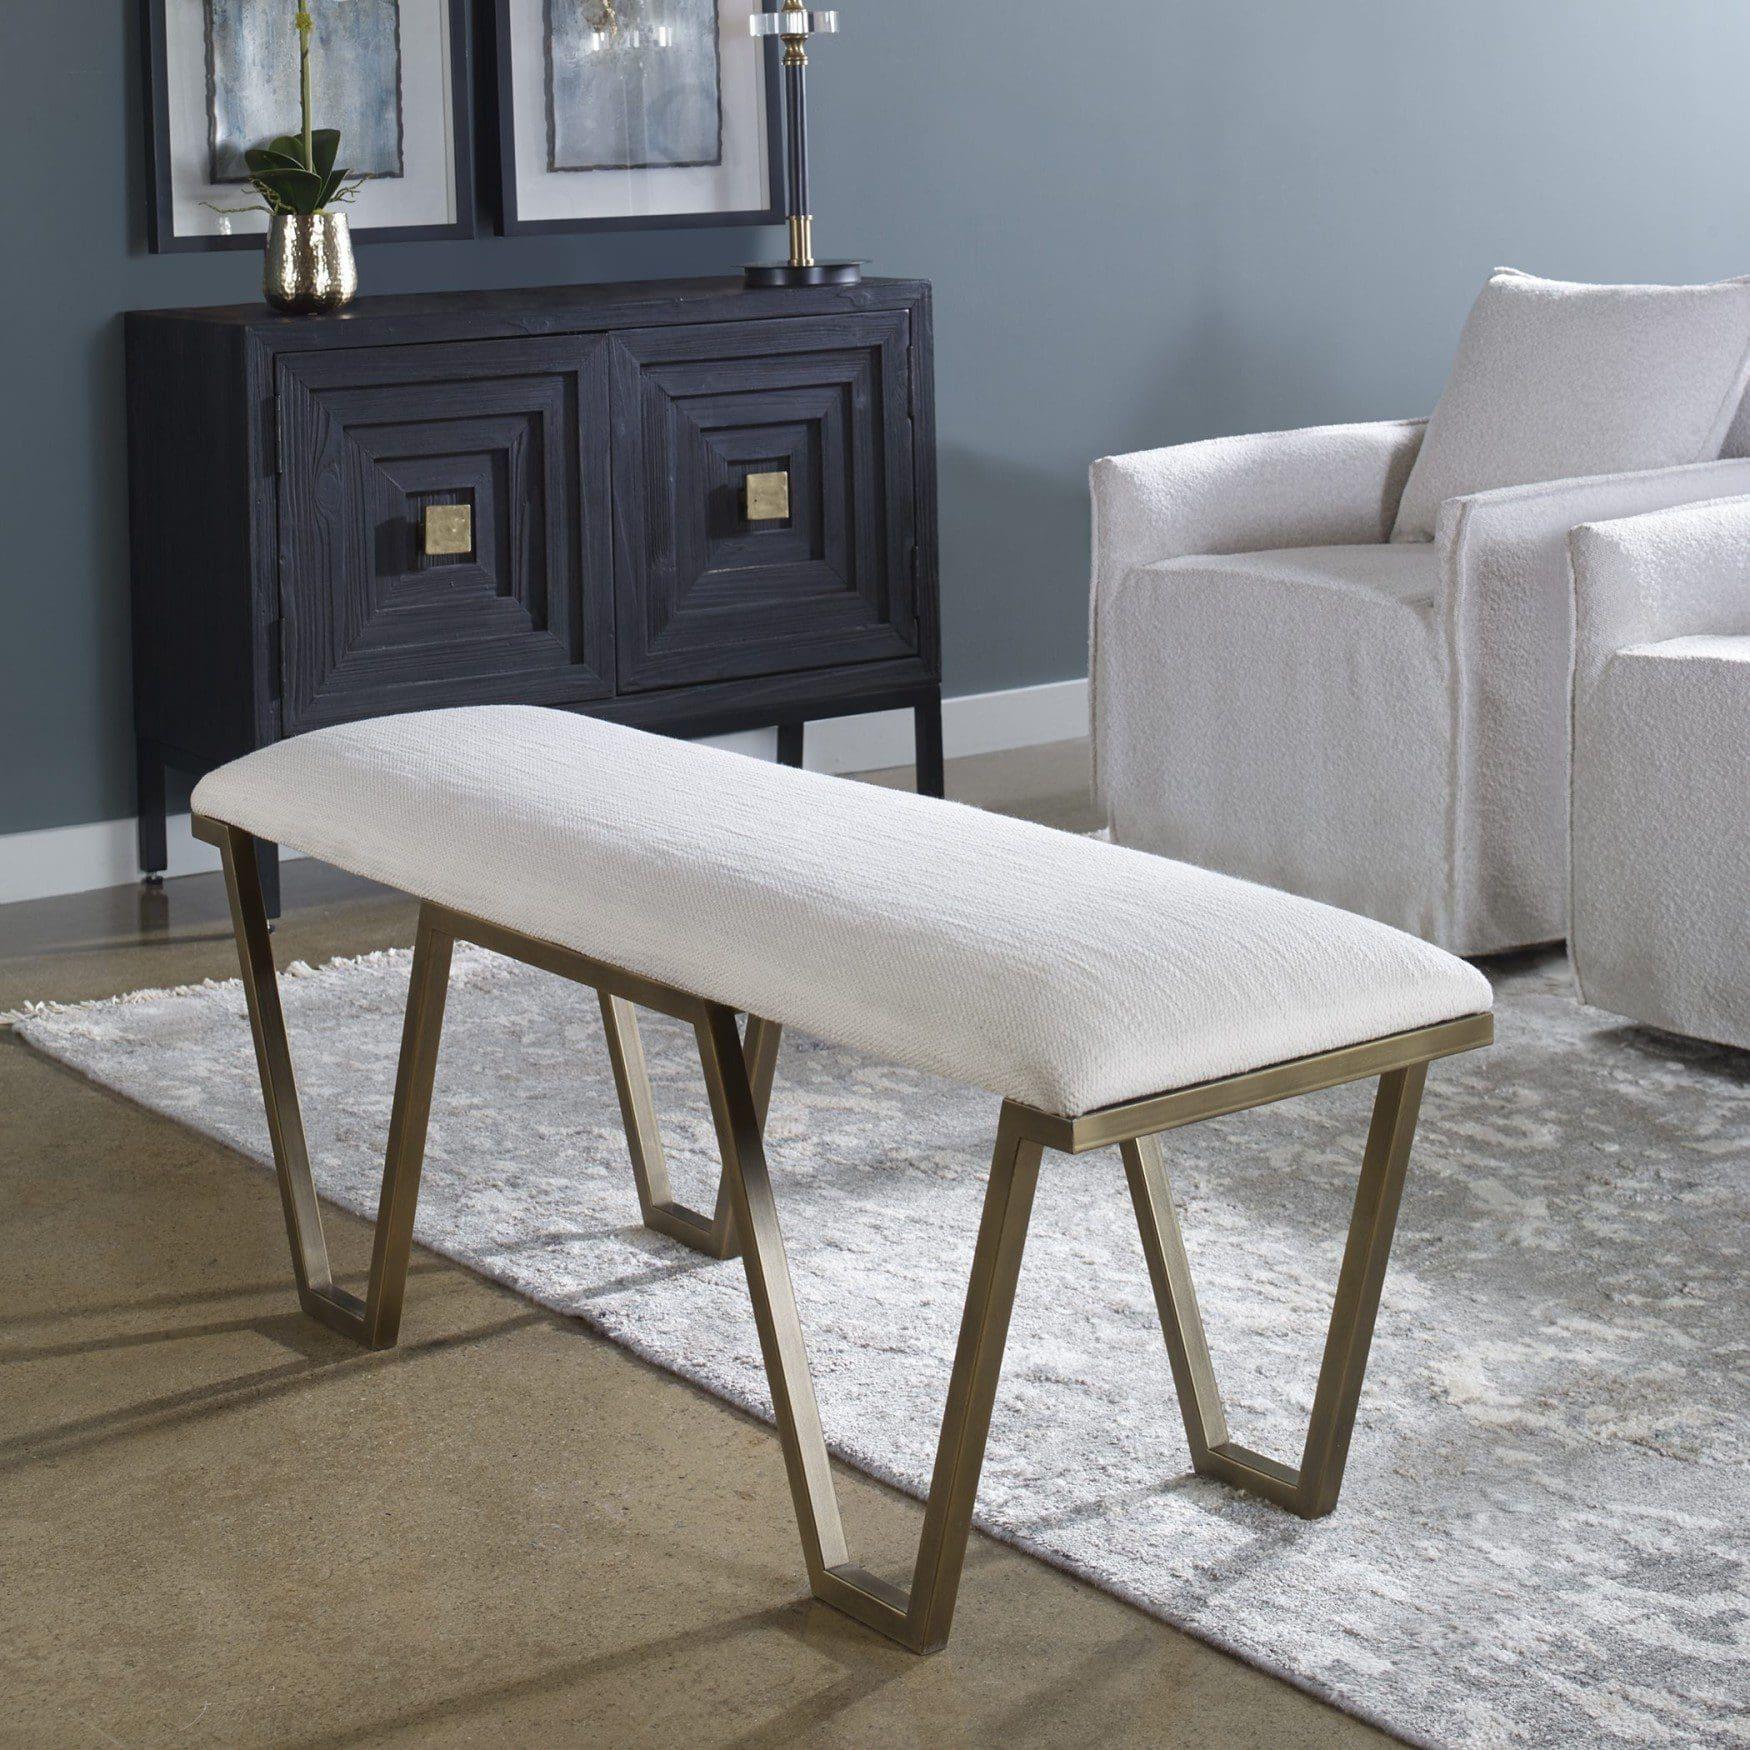 Uttermost Farrah Geometric Bench